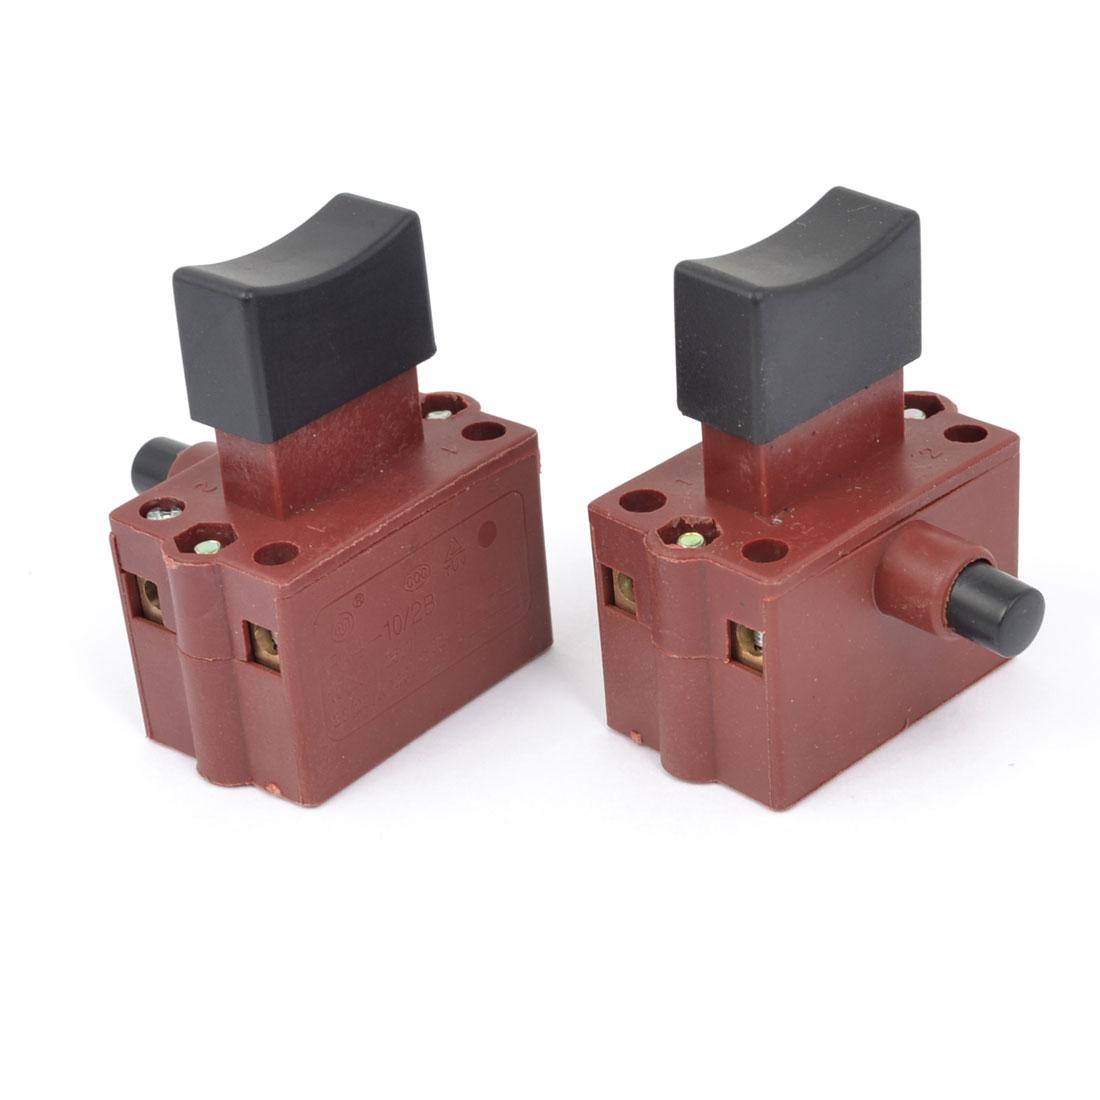 2pcs AC 250V 10A 125V 20A DPST Push Trigger Switch Electric Power Tool